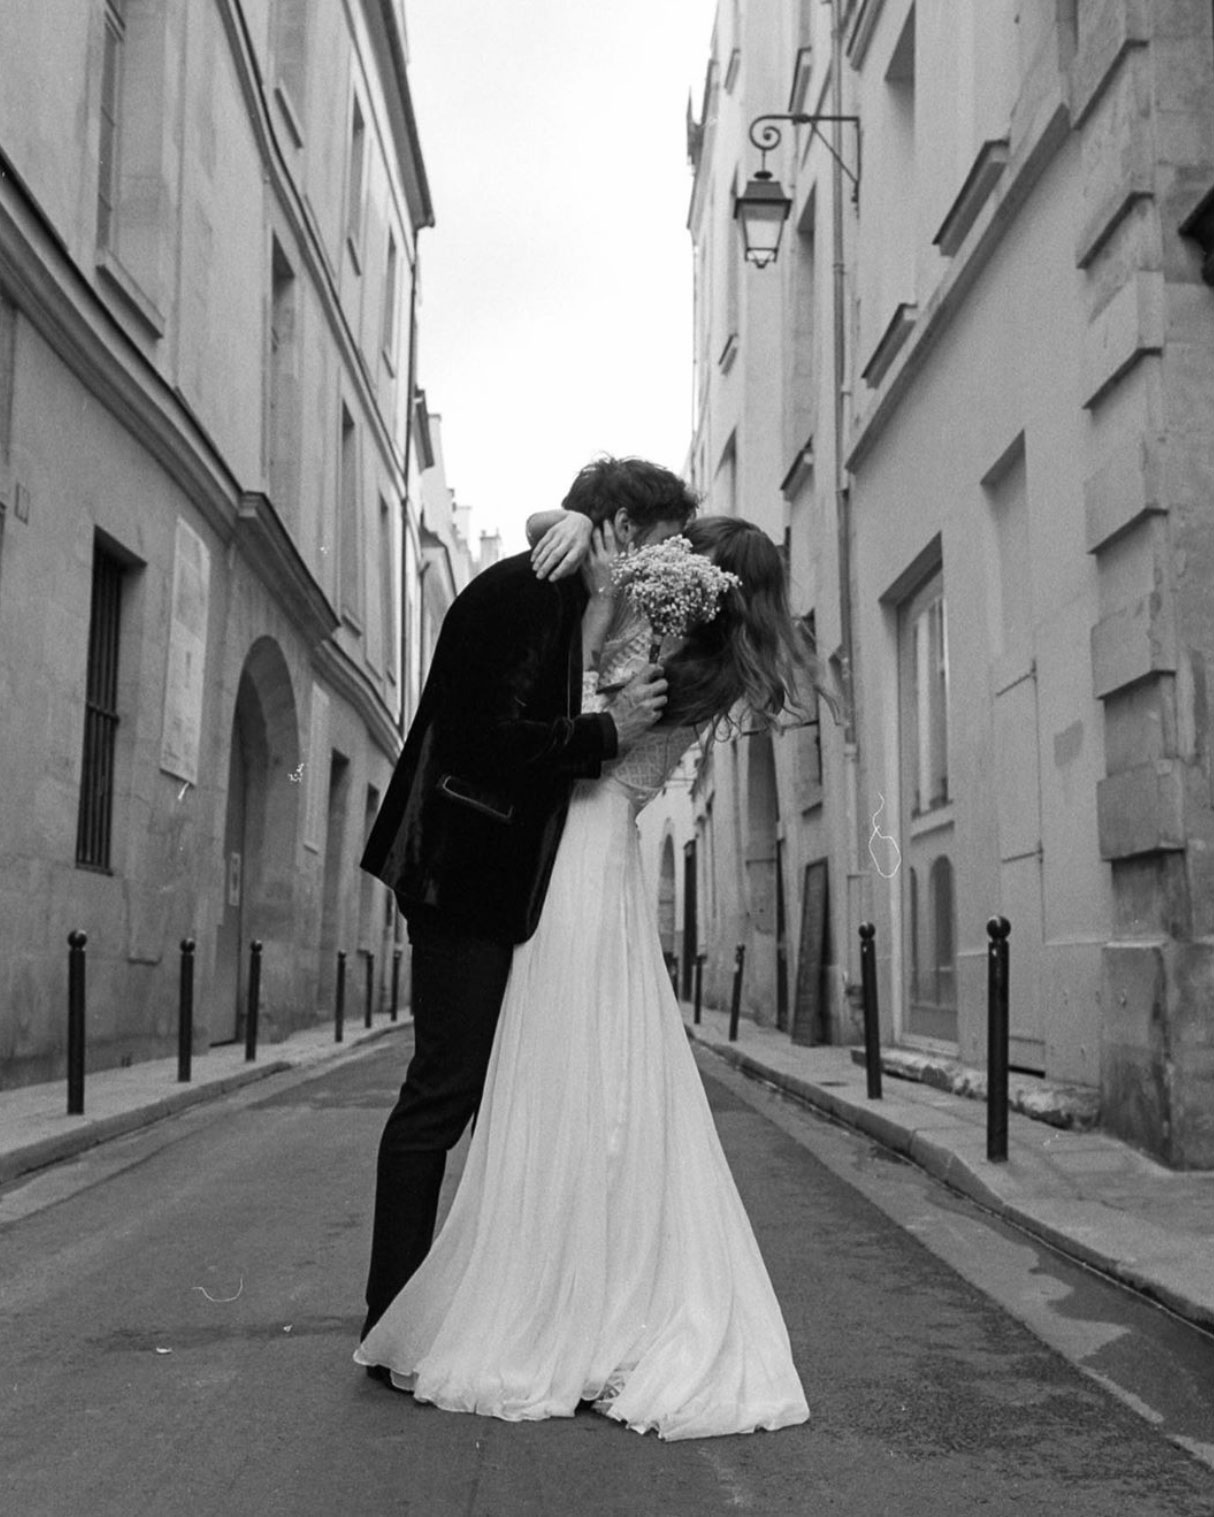 Phil-Chester-Sara-Byrne-Paris-Elopement-03.jpg